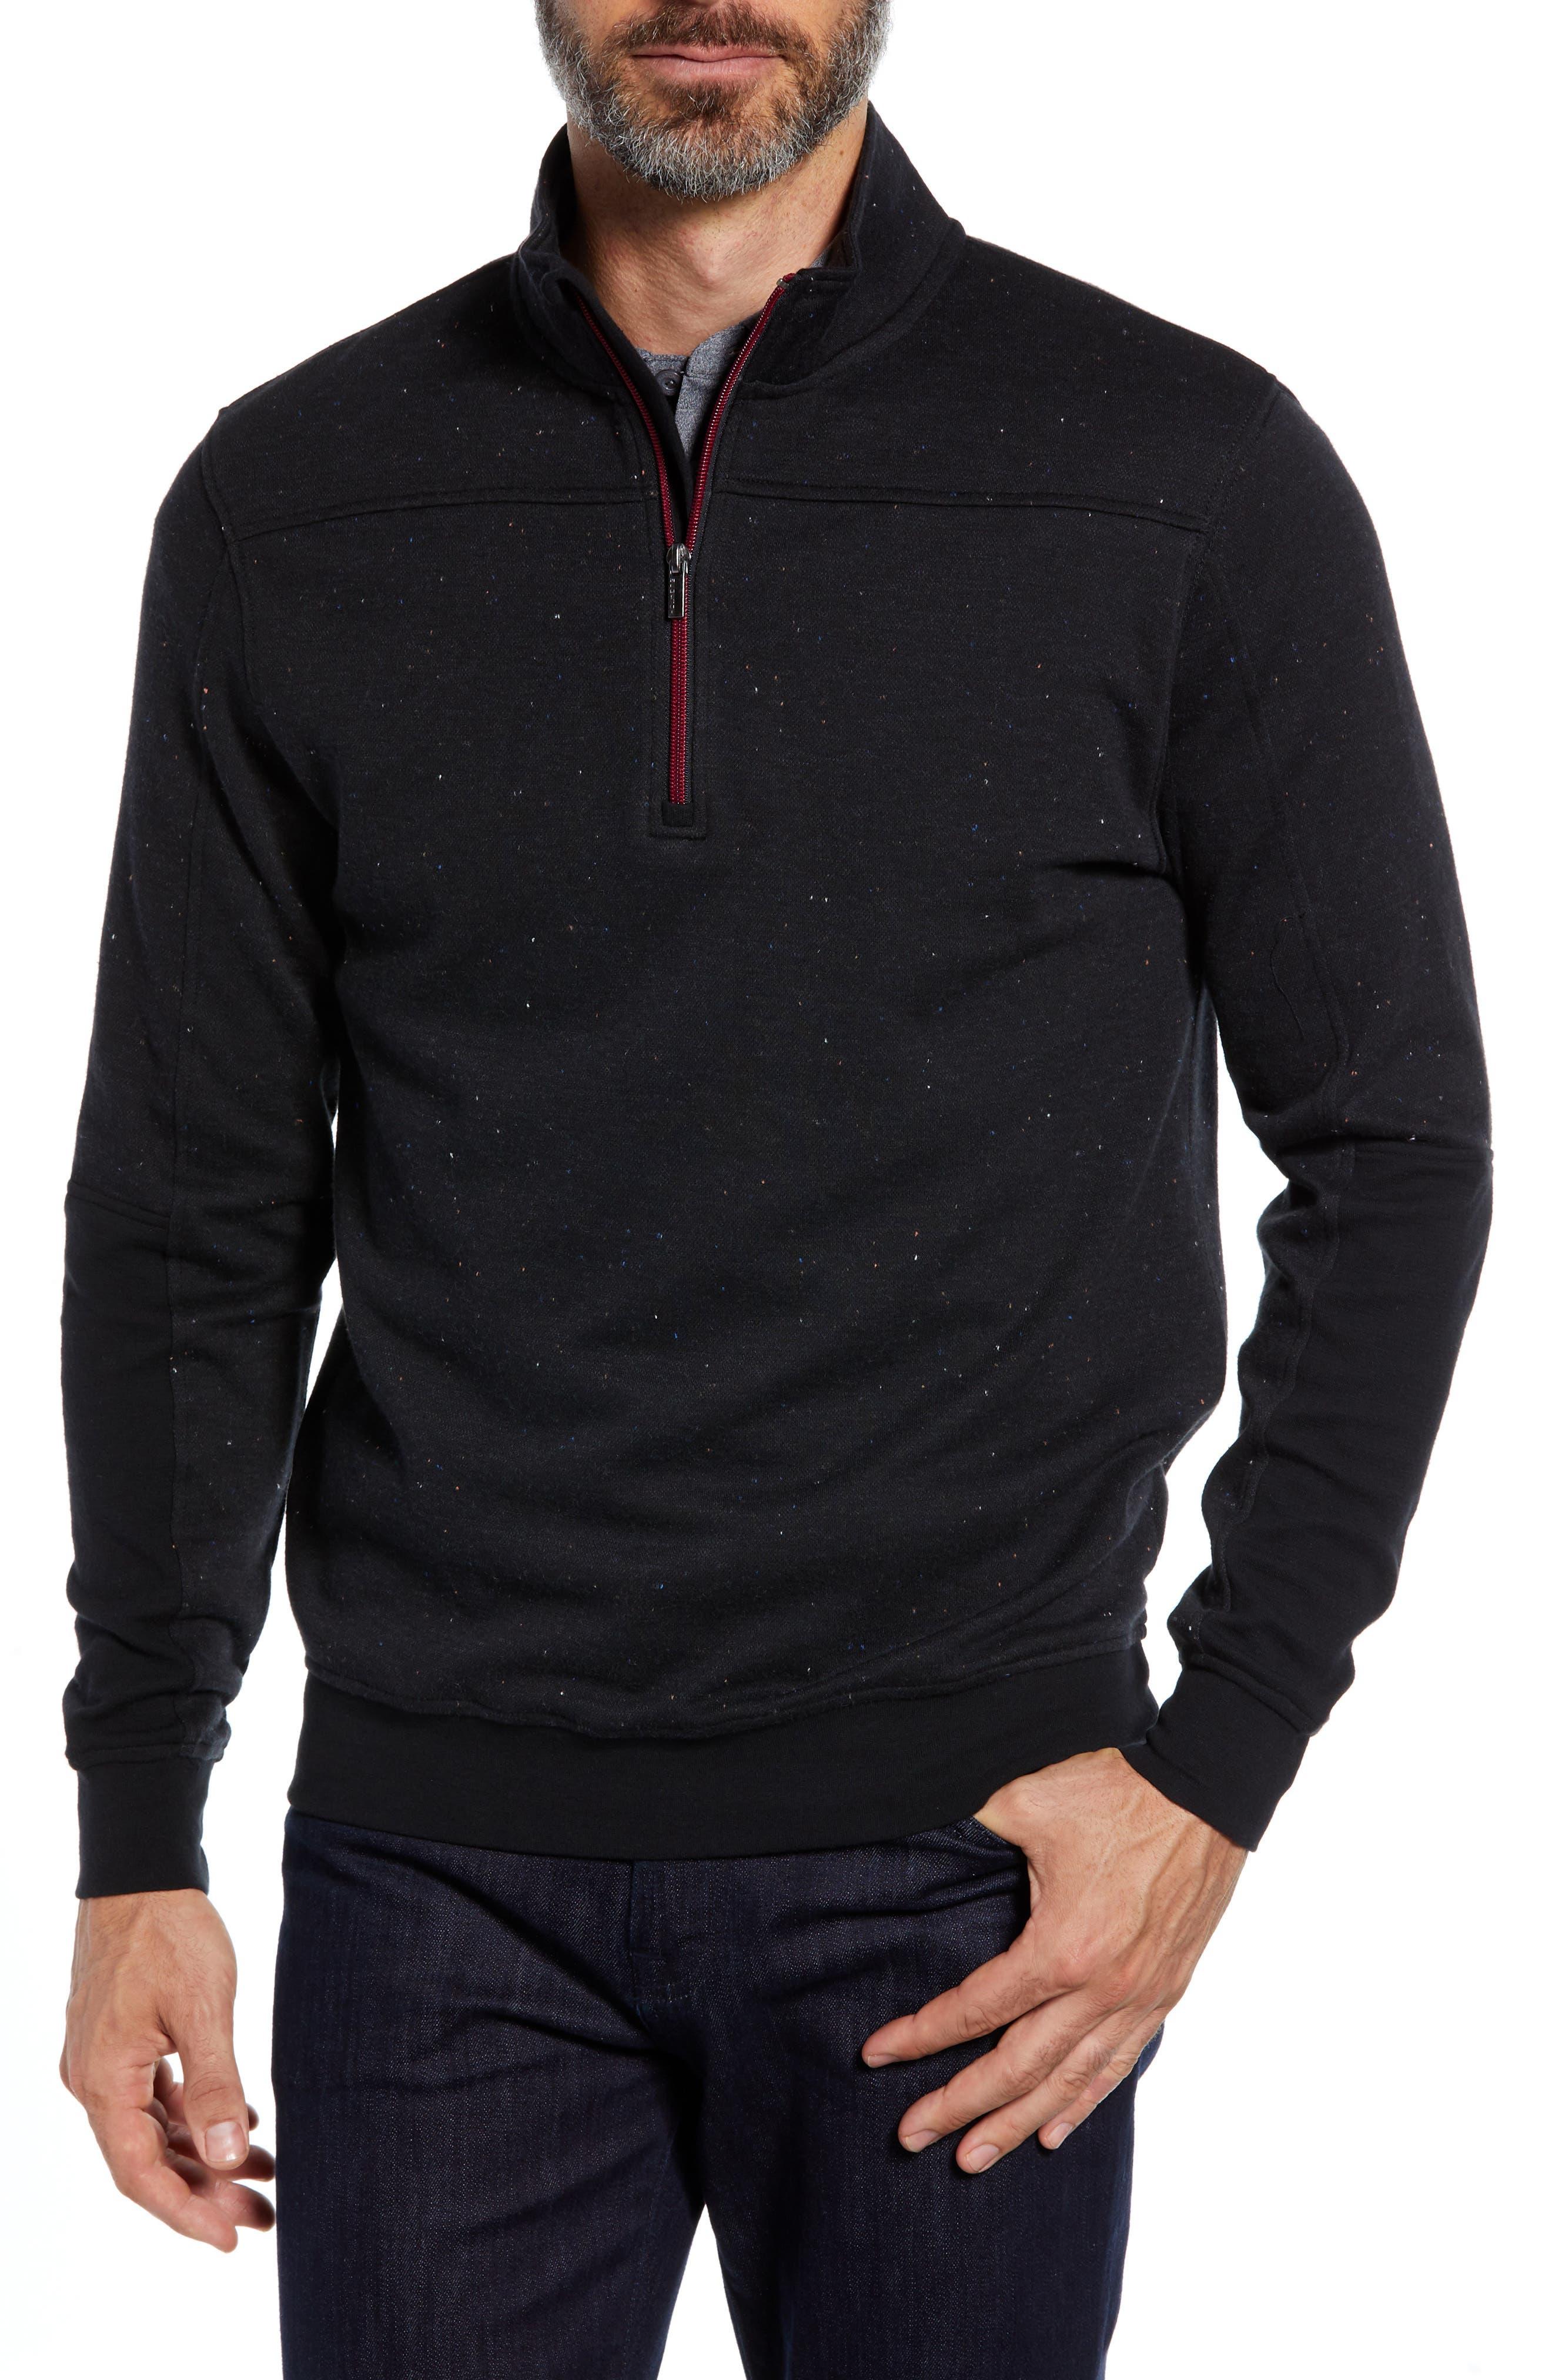 Regular Fit Pullover Sweatshirt,                             Main thumbnail 1, color,                             NAVY